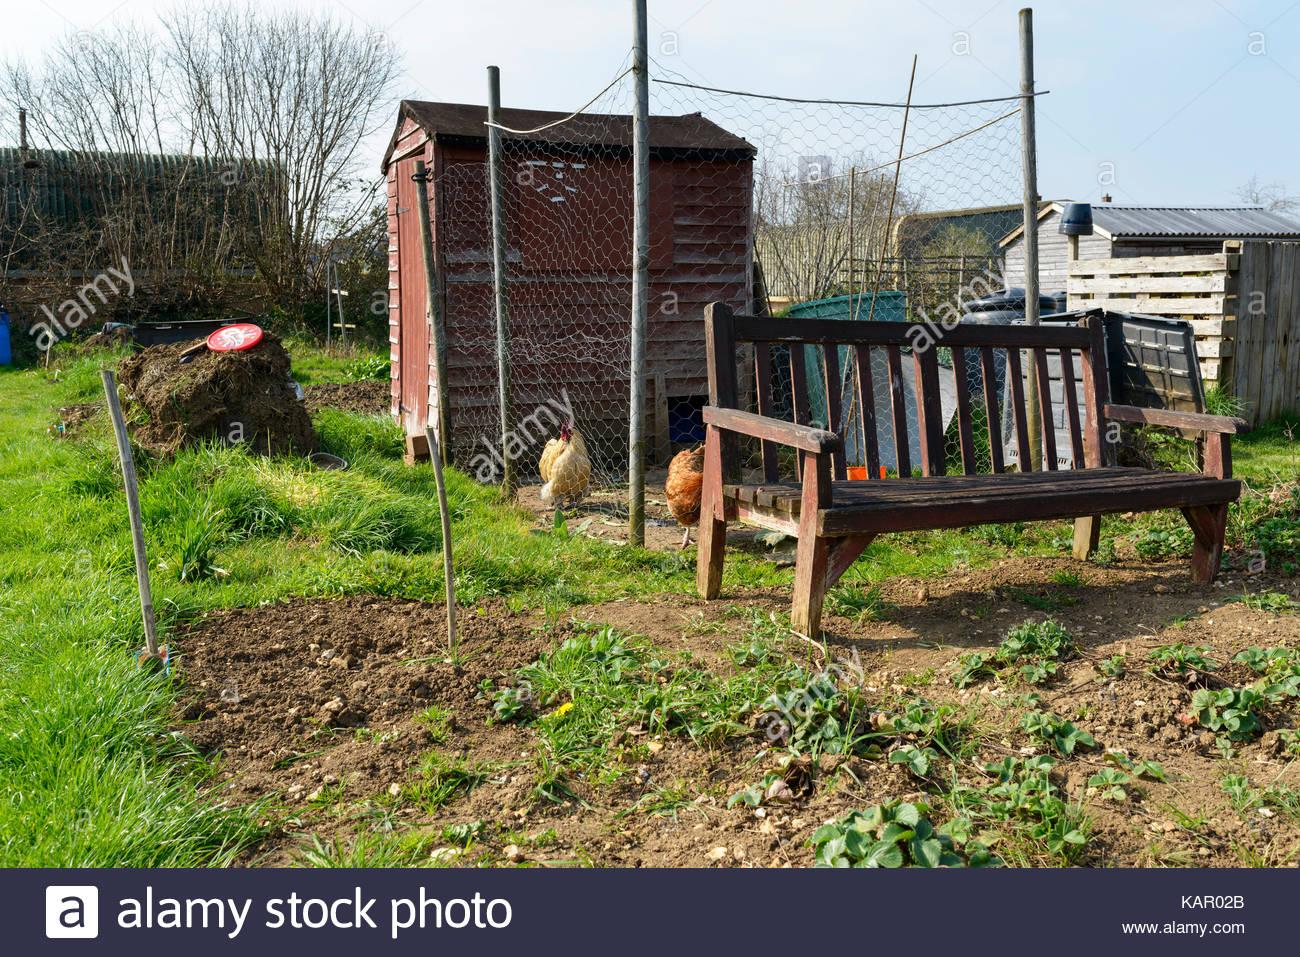 Allotment, Sturminster Newton, Dorset, England, UK - Stock Image